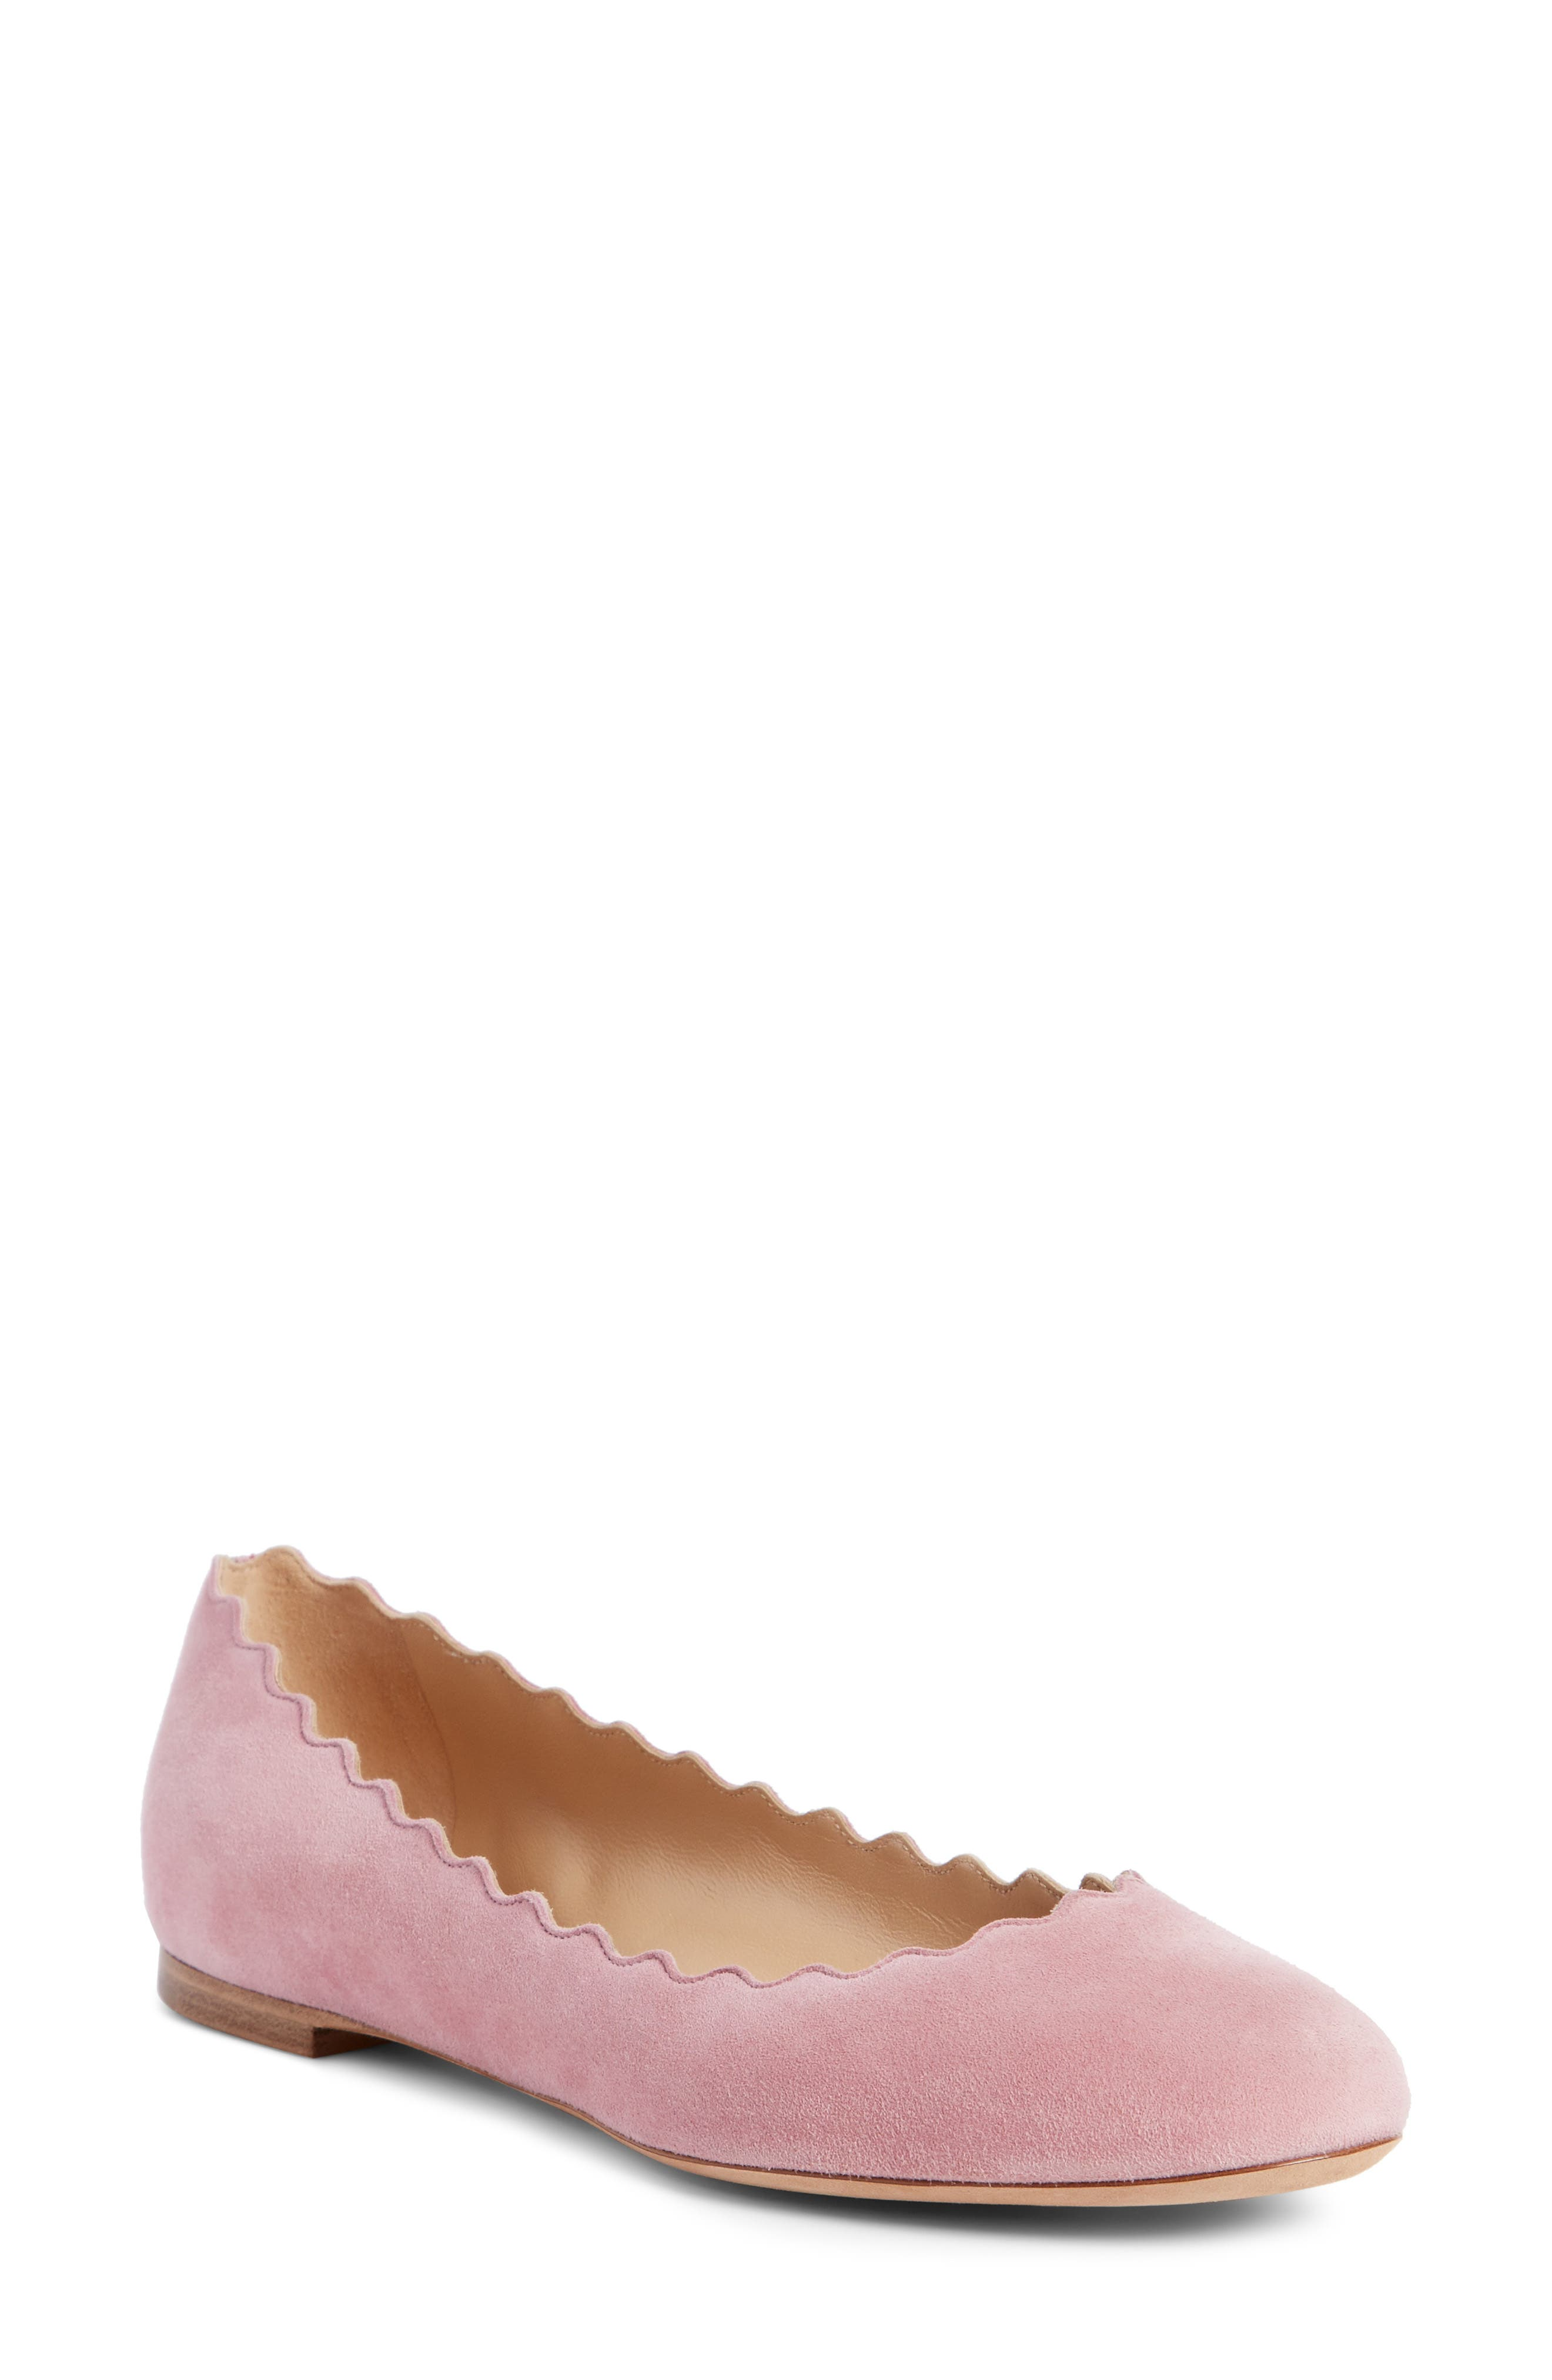 Ballet Flats Ballerina Shoes for Women On Sale, Dark Blue, Suede leather, 2017, 4.5 6.5 9.5 Pretty Ballerinas